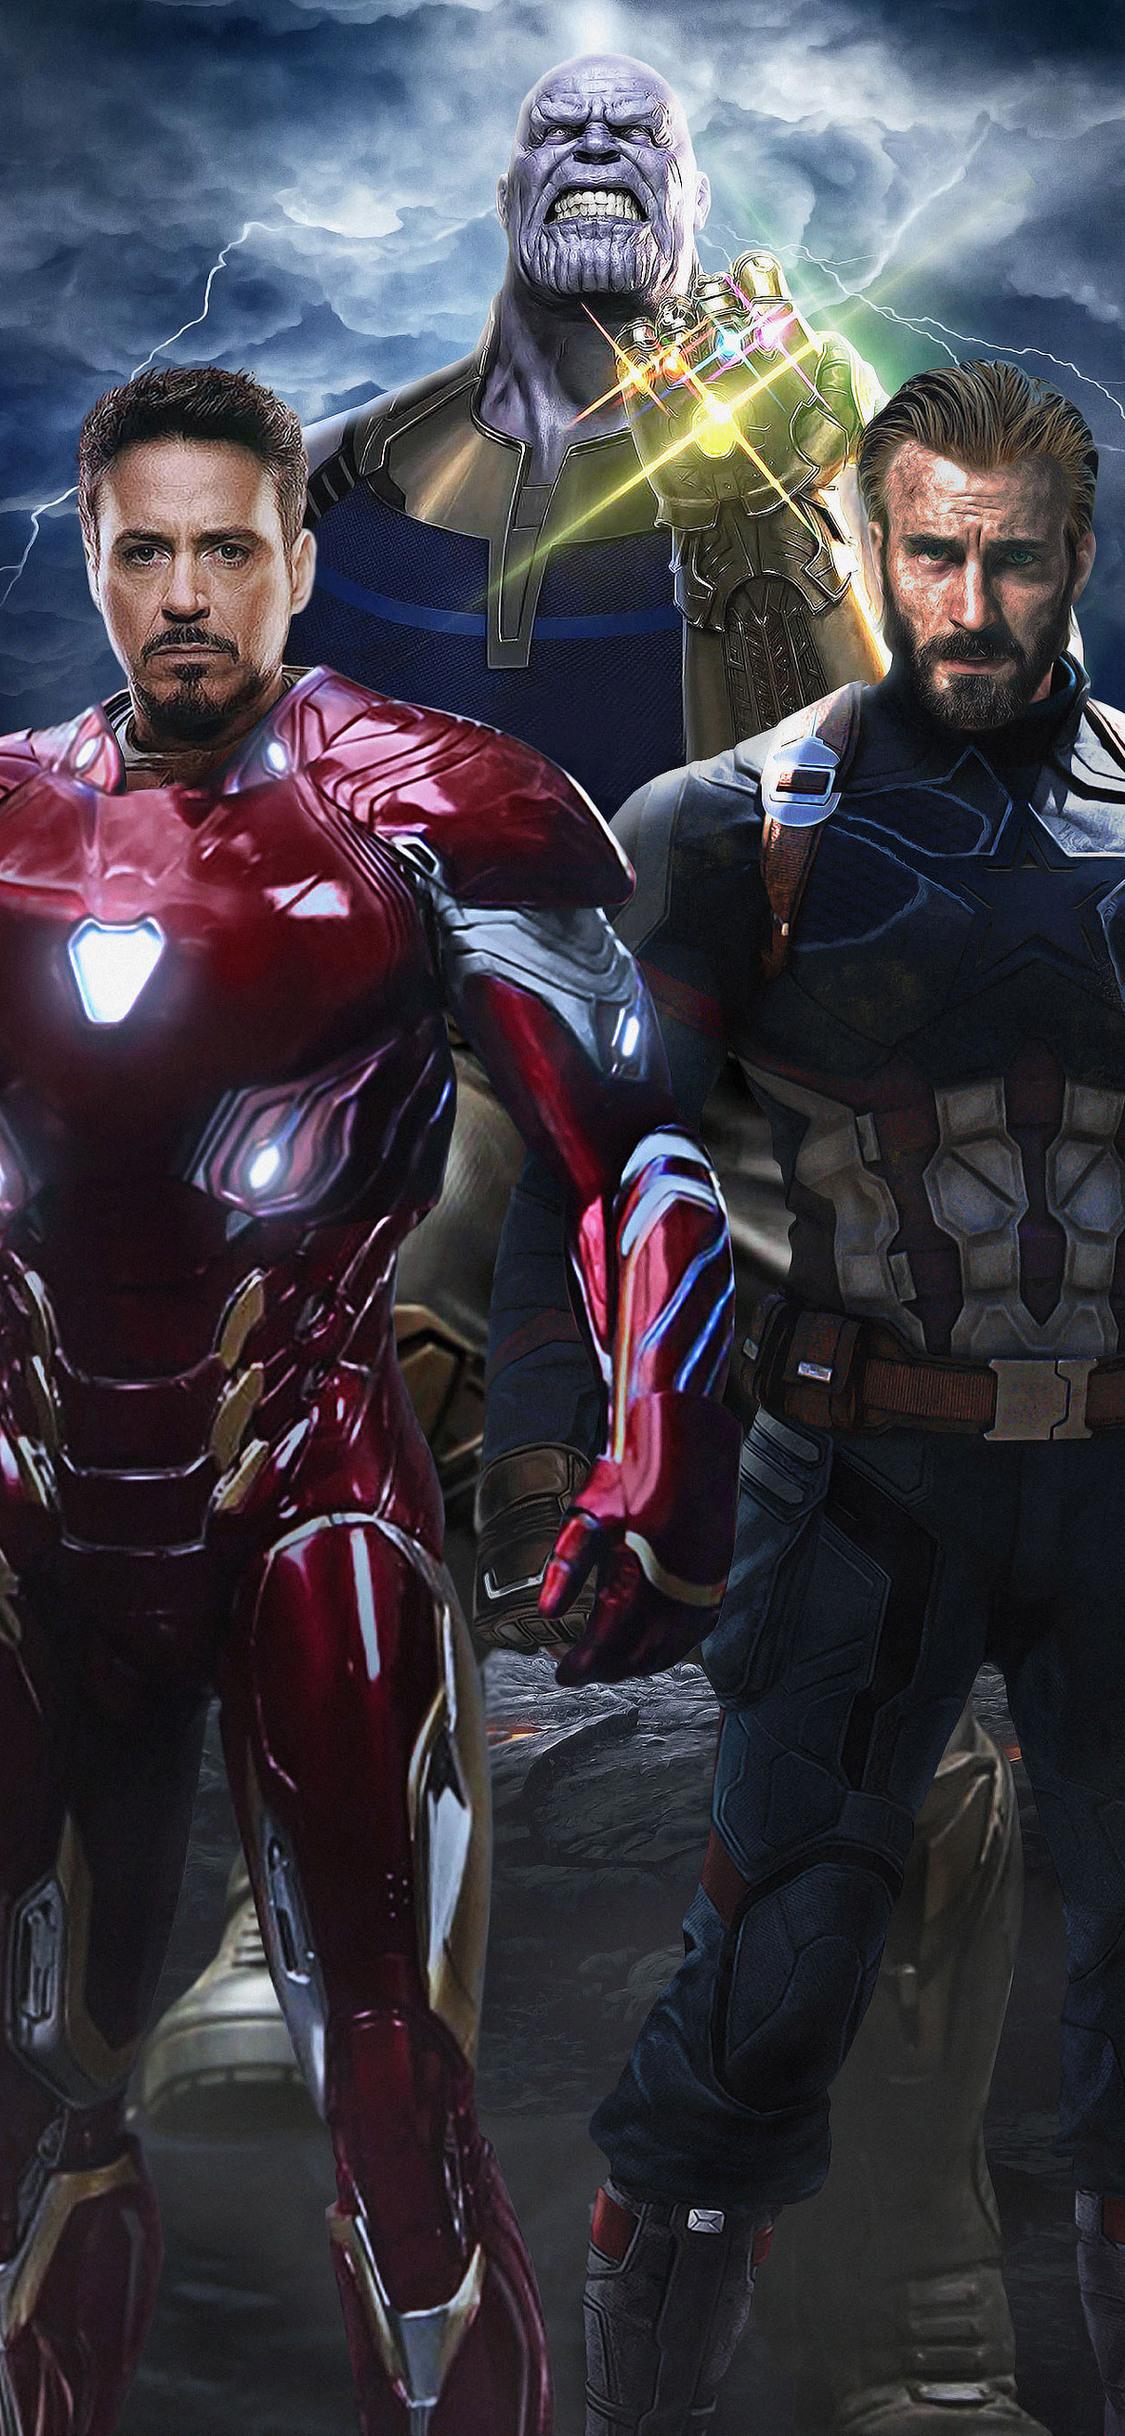 1125x2436 Avengers Infinity War Captain America Iron Man Thanos